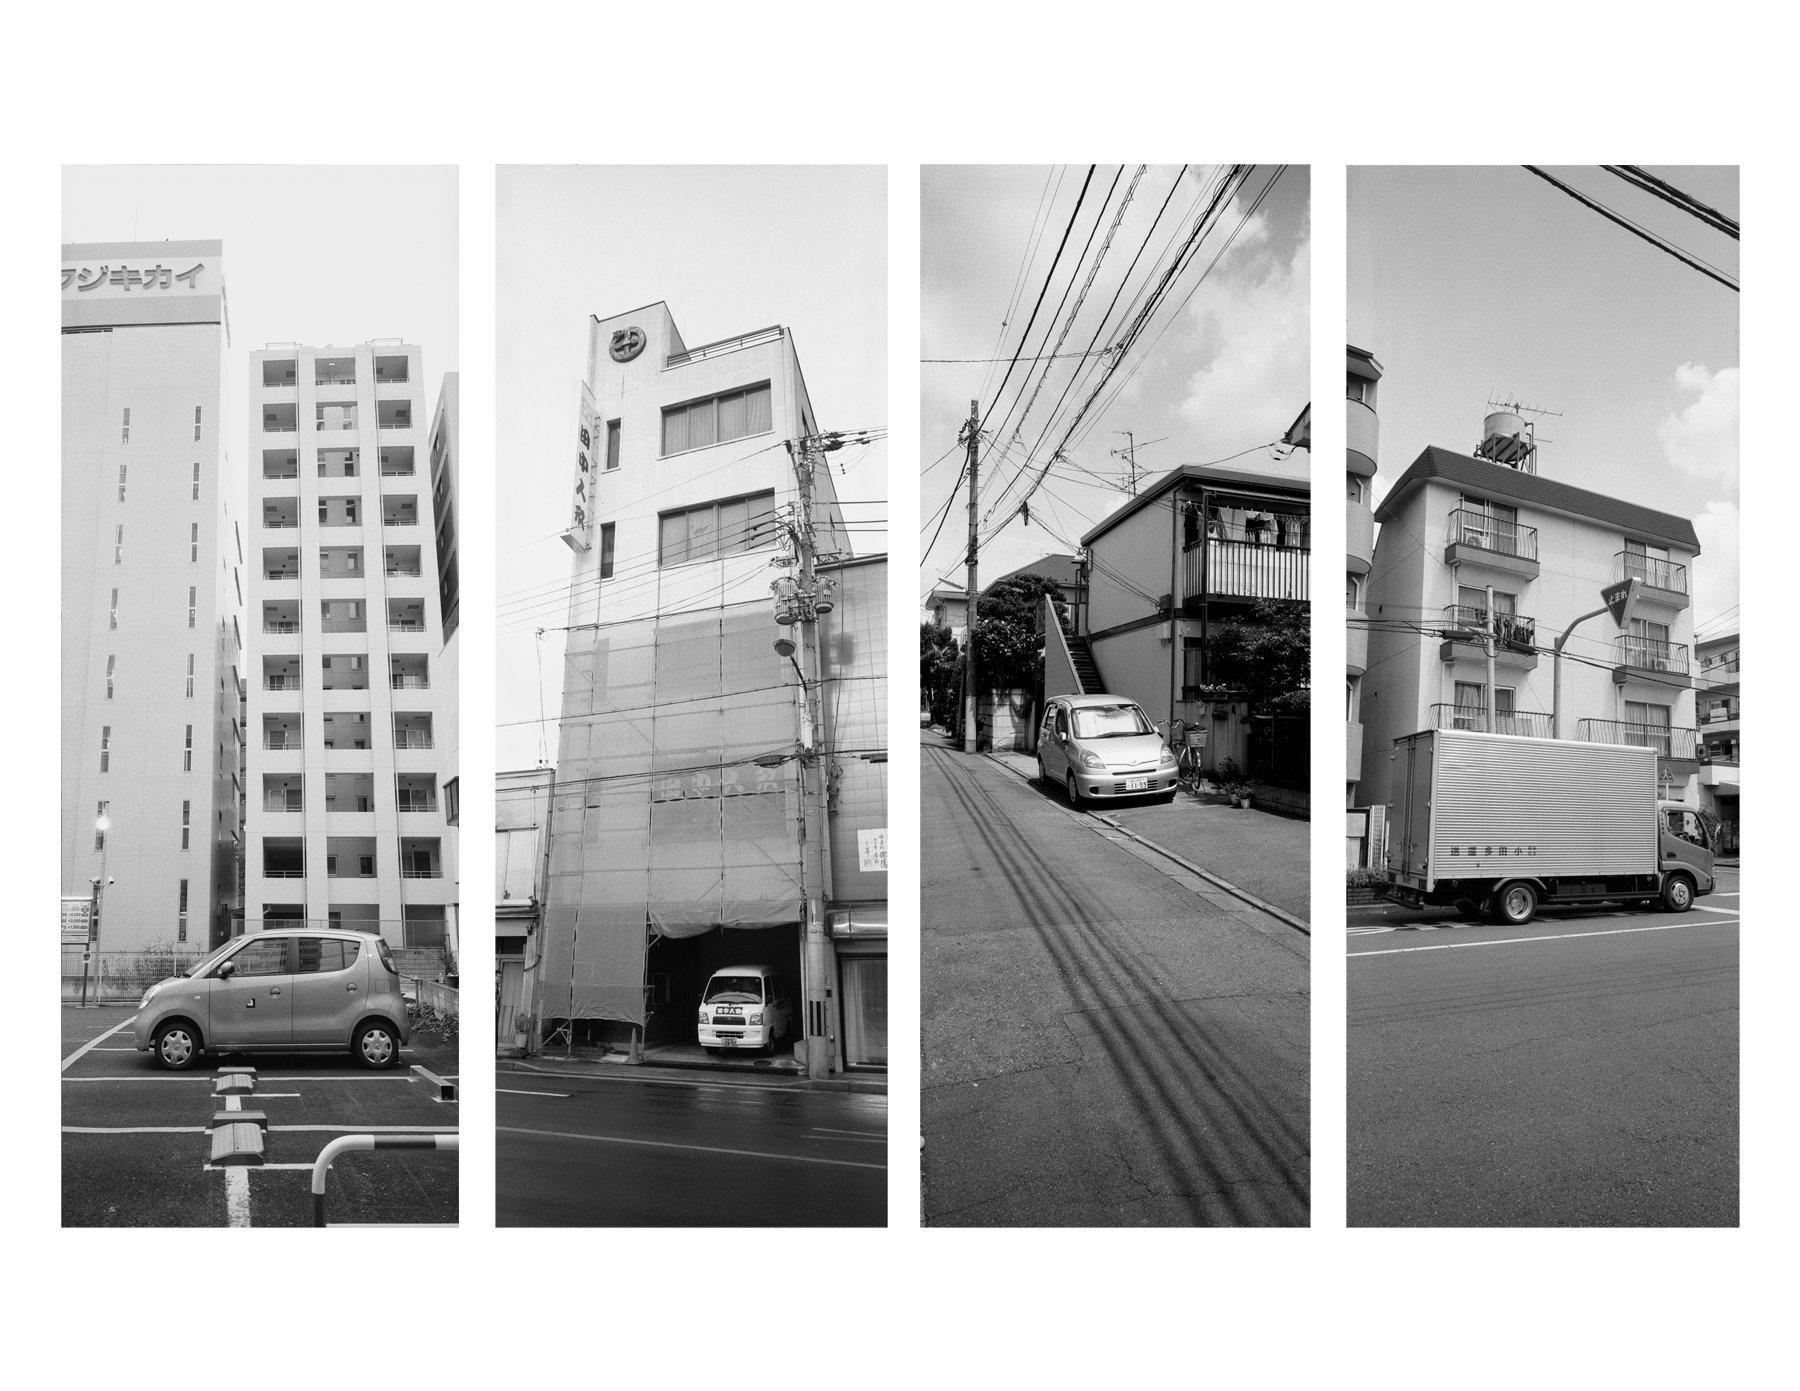 pan 4 vert cars & buildings small.jpg